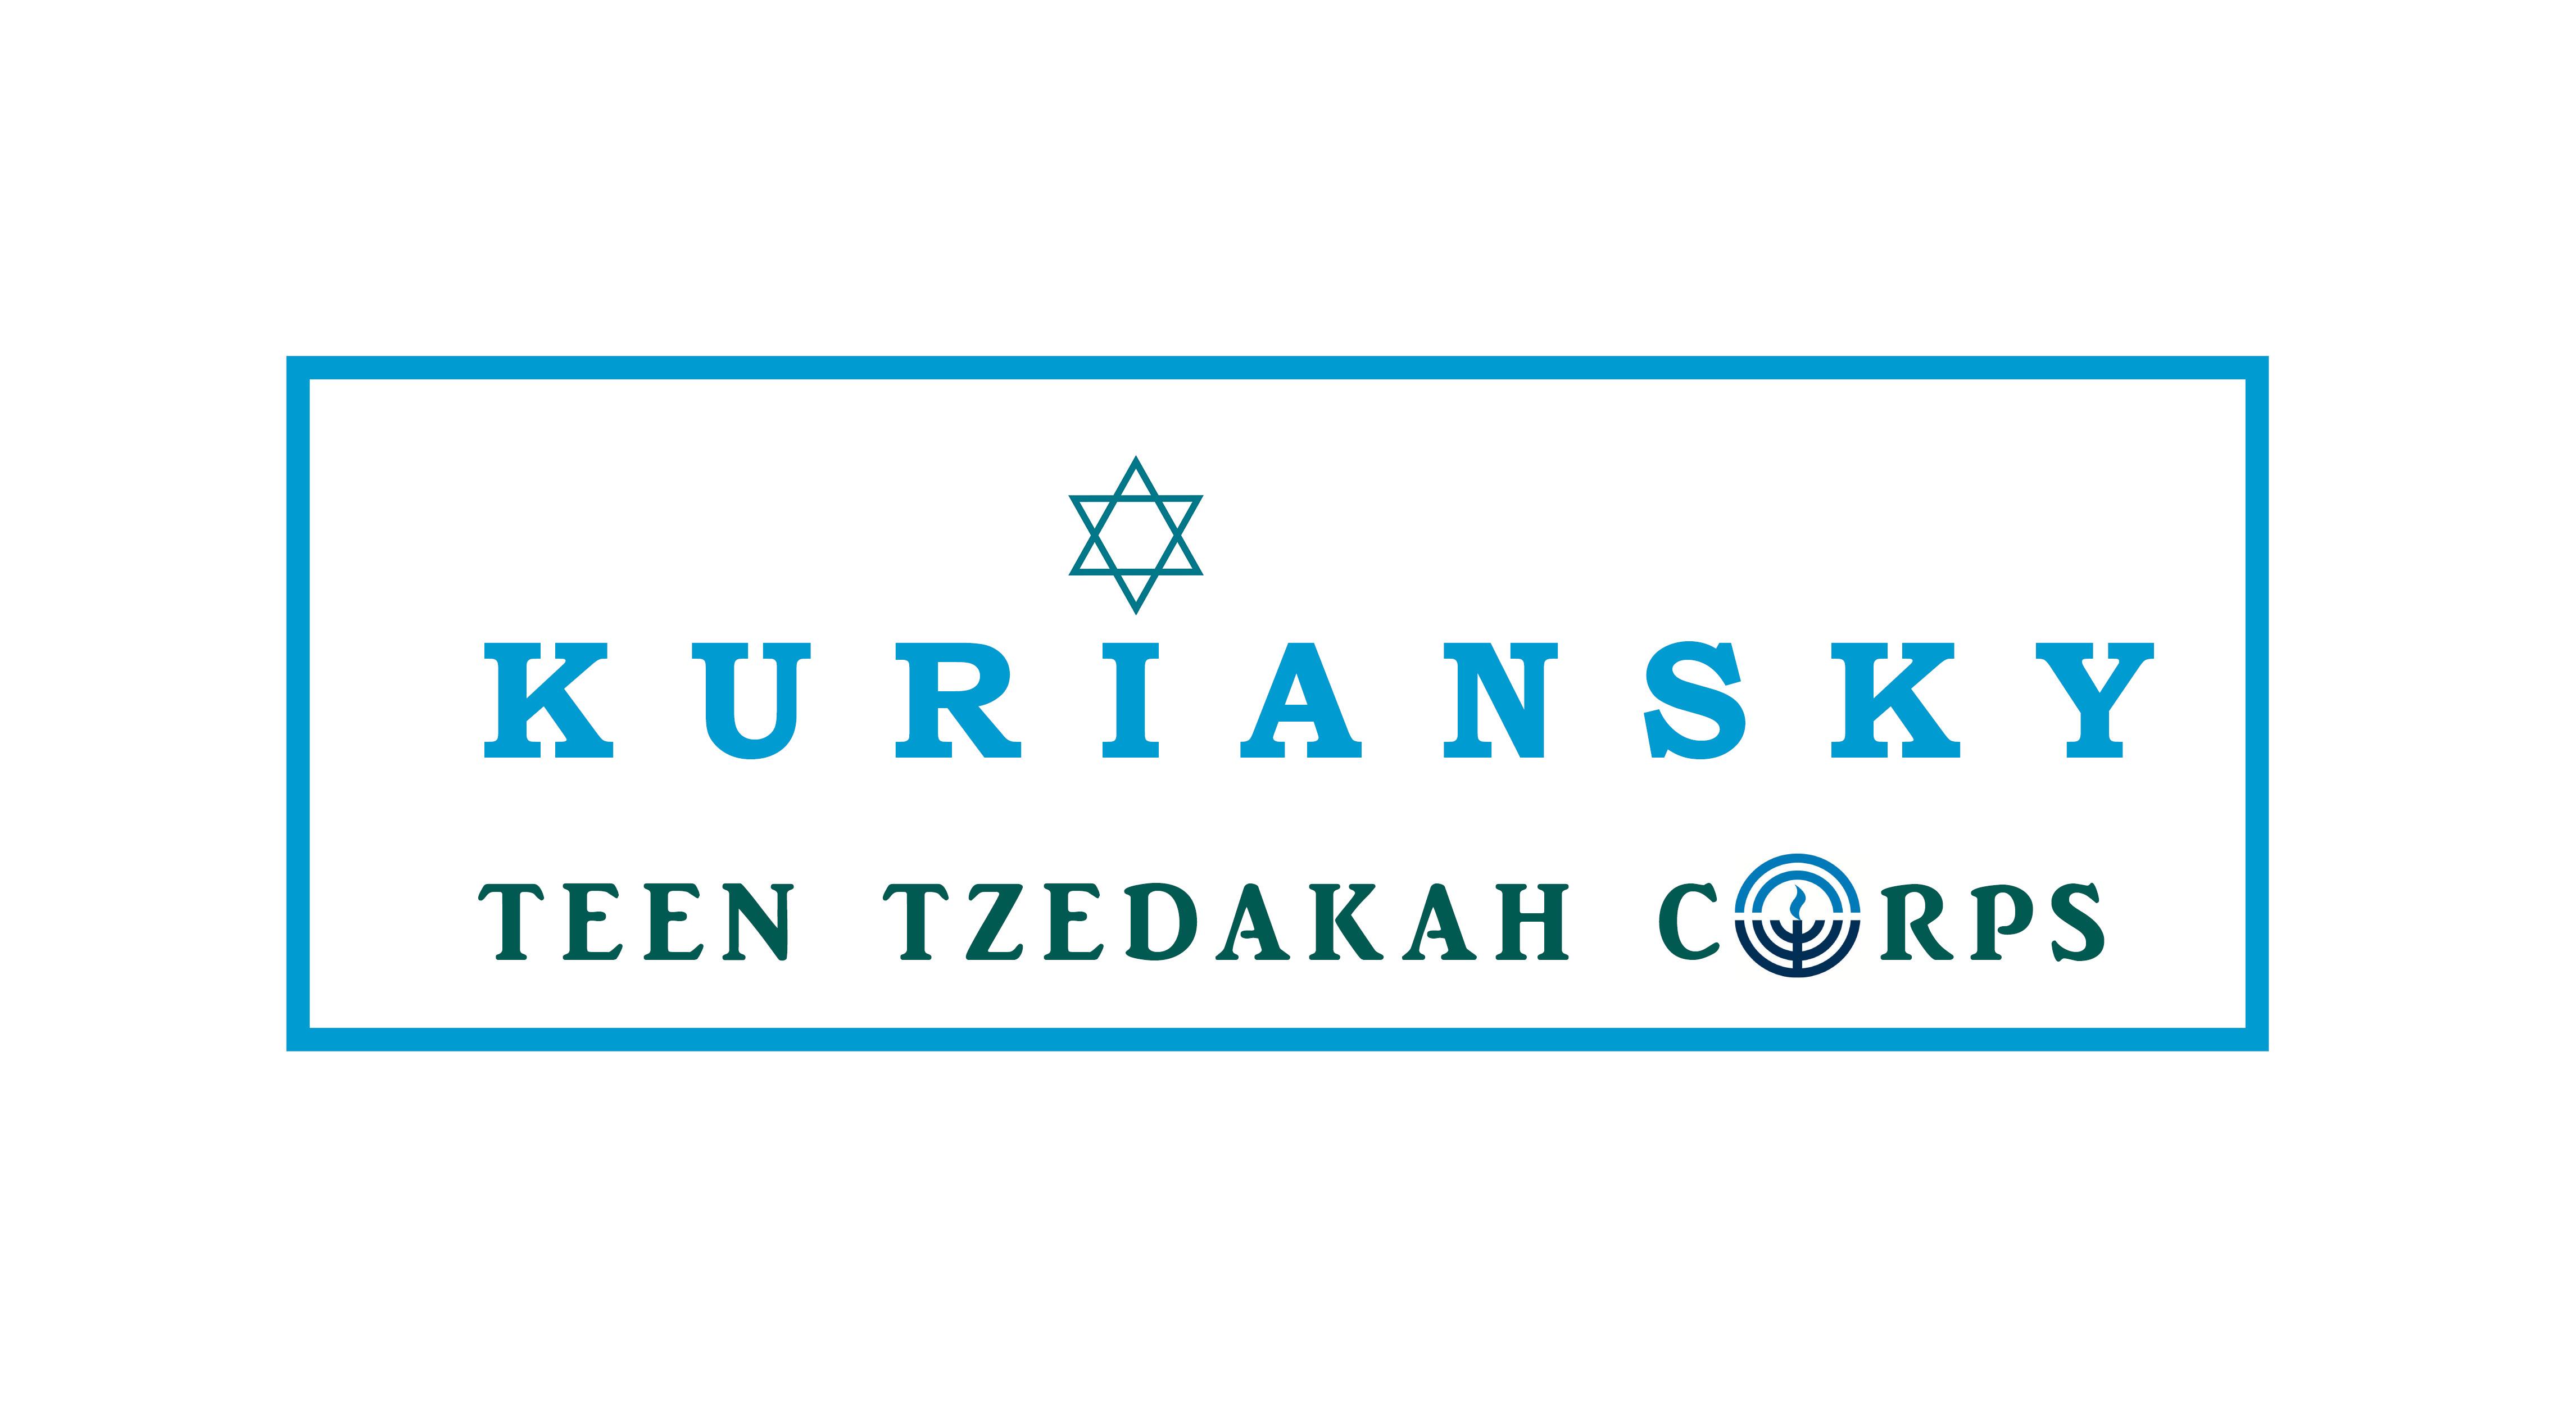 Best-Kuriansky-logo.jpg